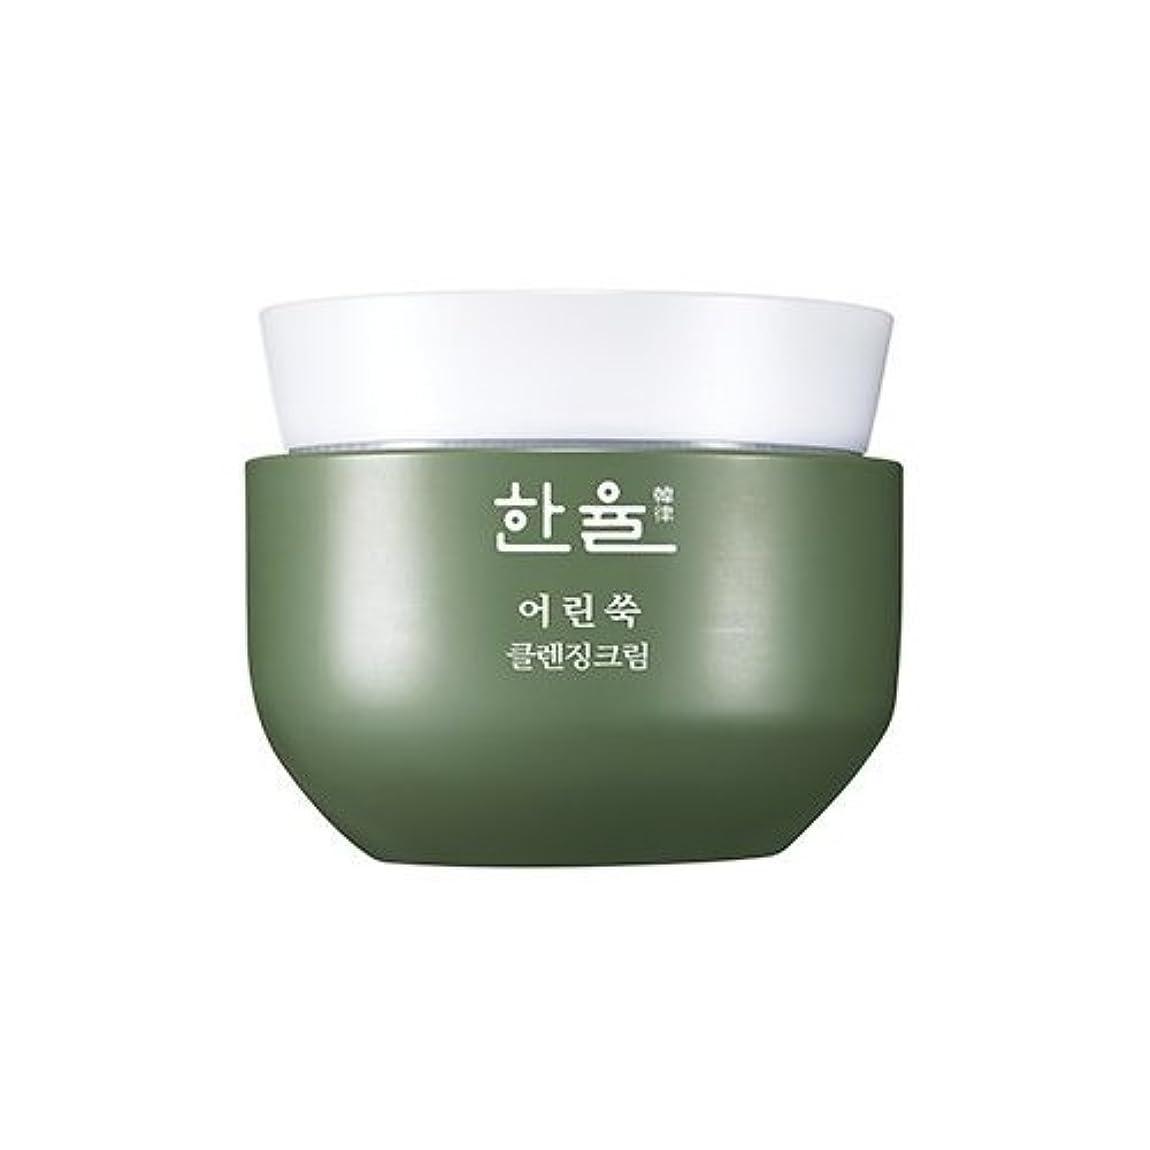 大臣肯定的歴史的Hanyul Pure Artemisia Cleansing Cream